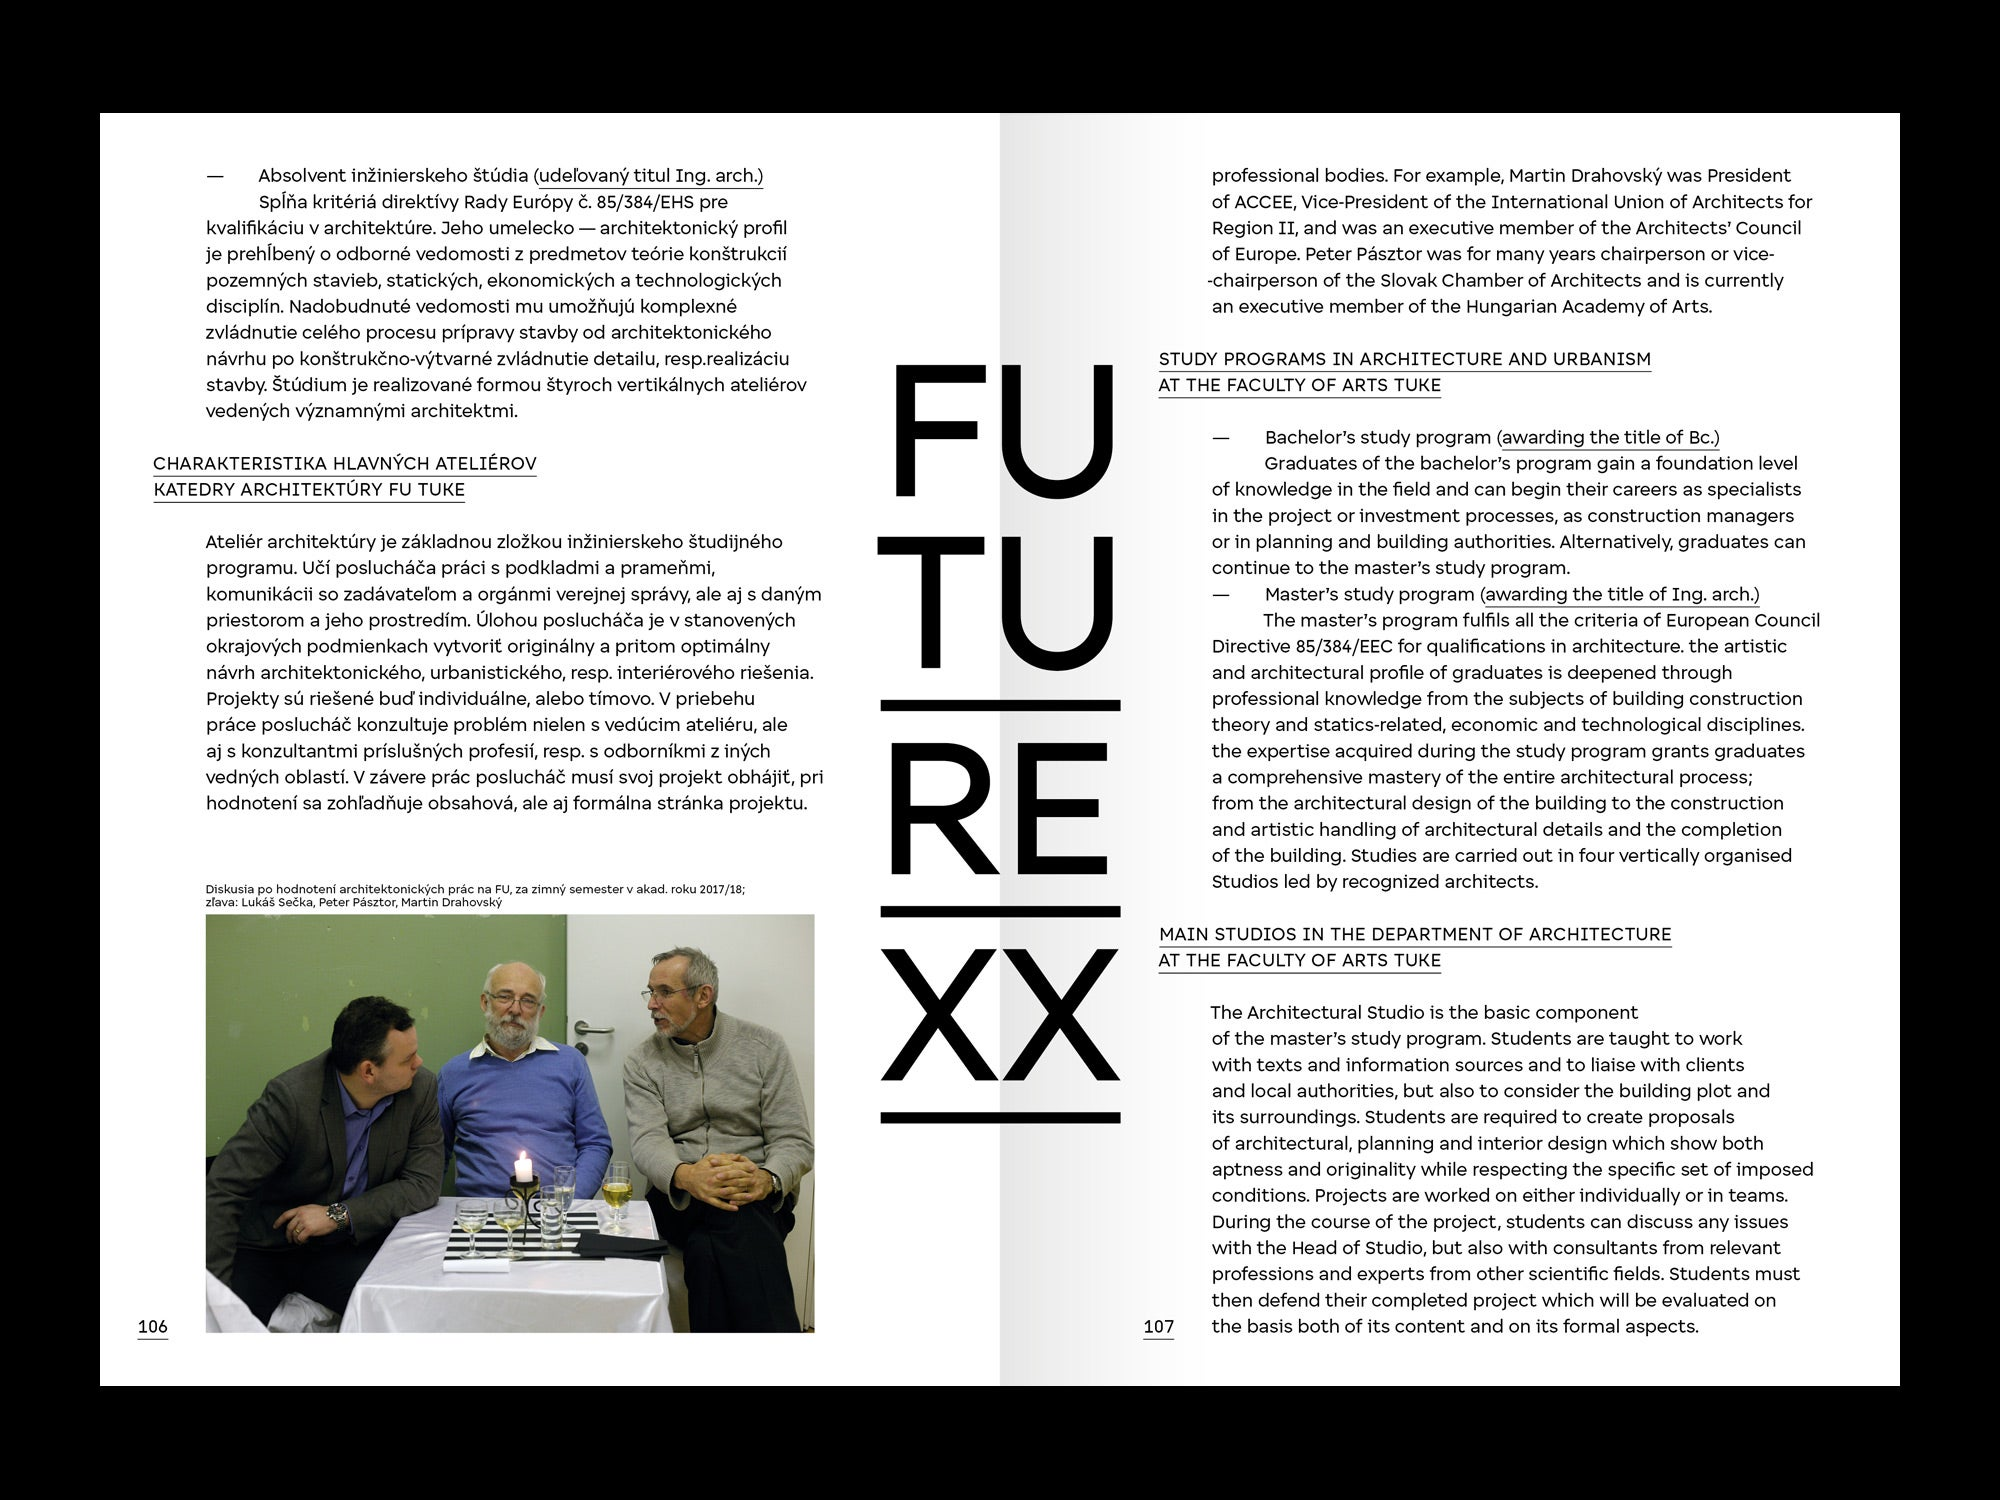 FUTUREXX_09a.jpg